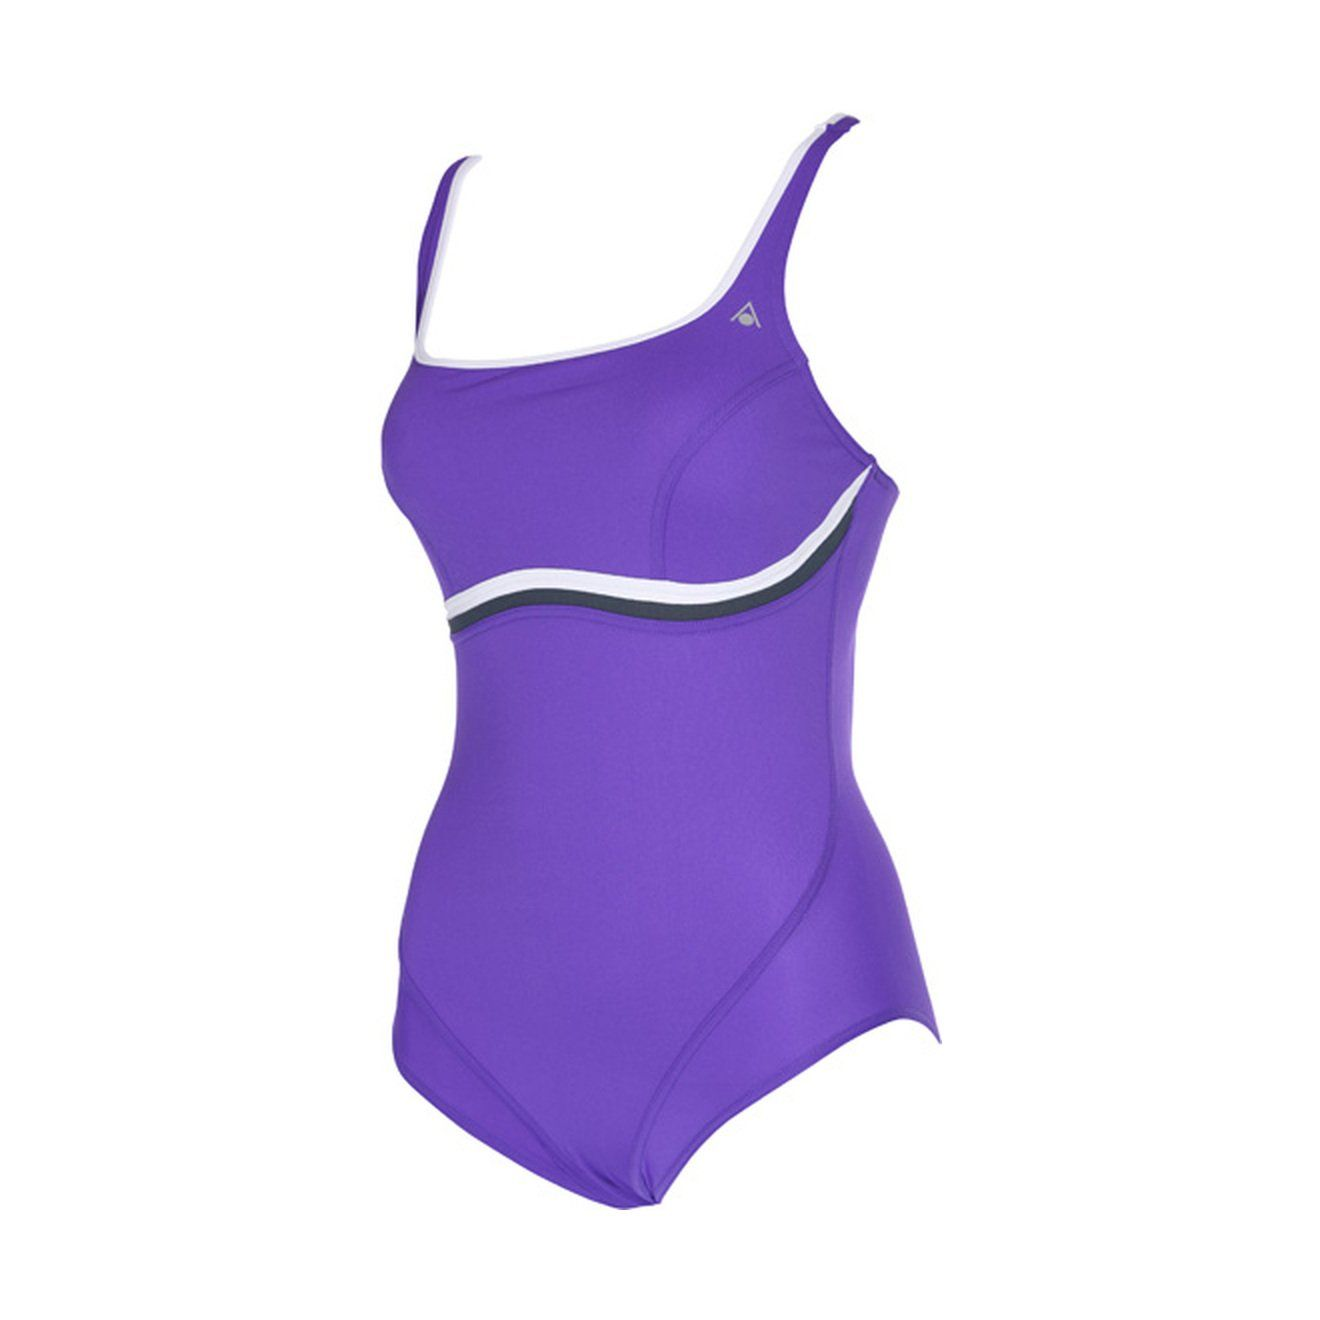 65b1b26bc8 aqua sphere nazca open back ladies swimsuit purple/white,32#nazca, #open, # aqua